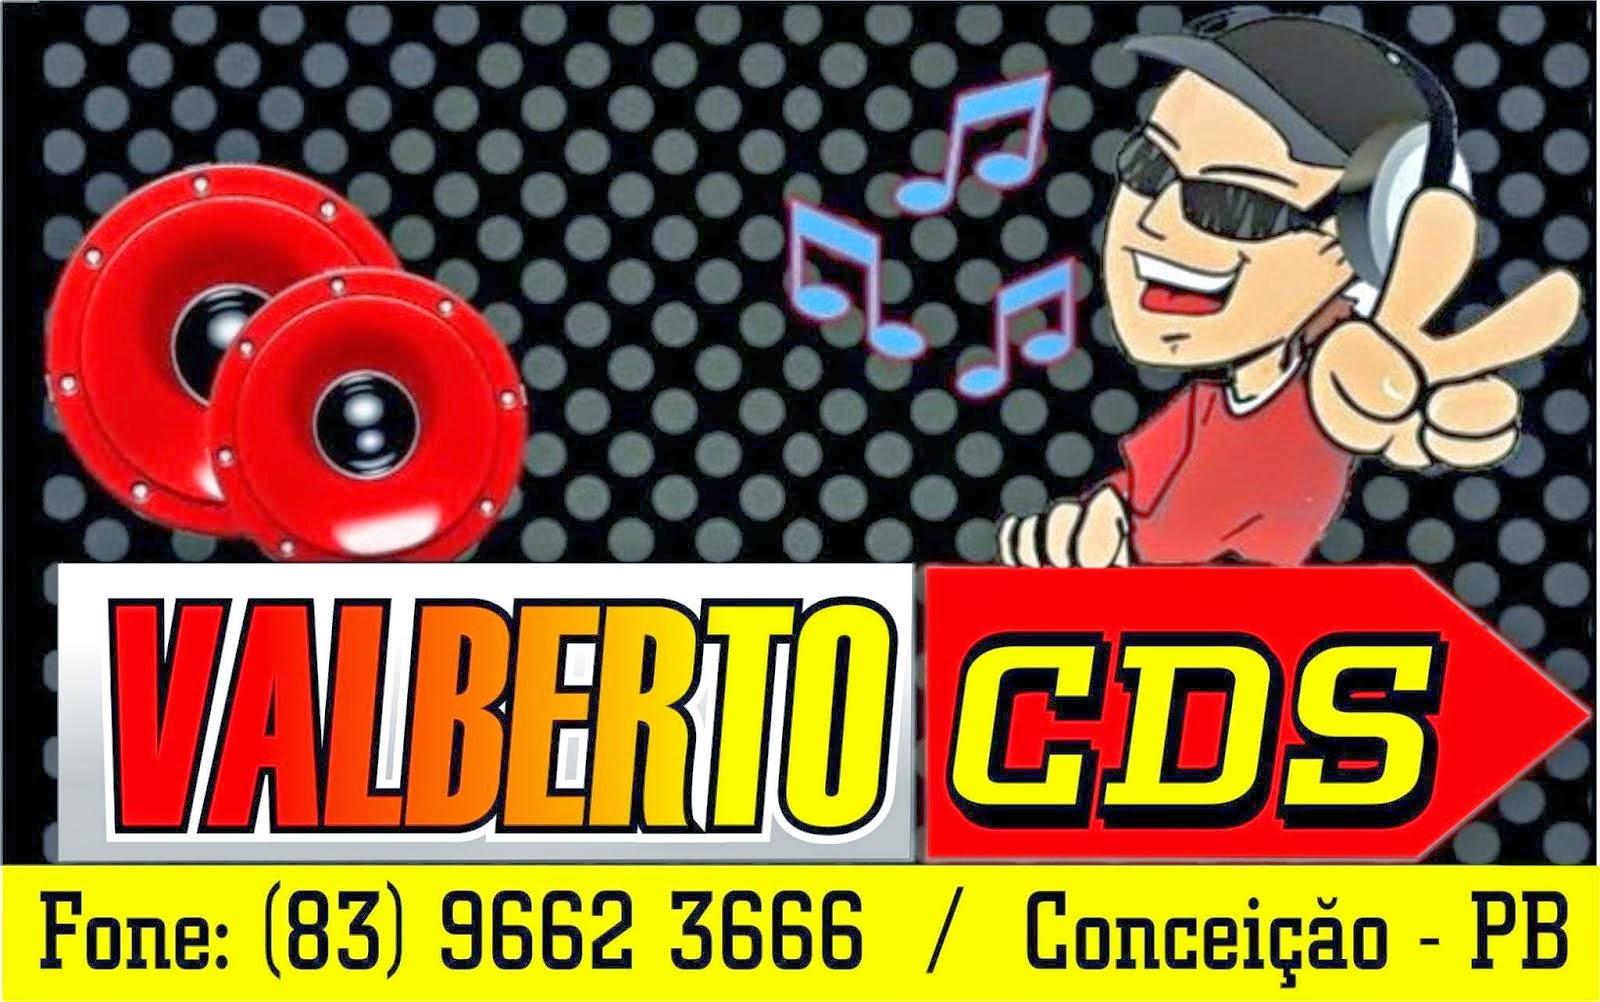 Valberto CD's